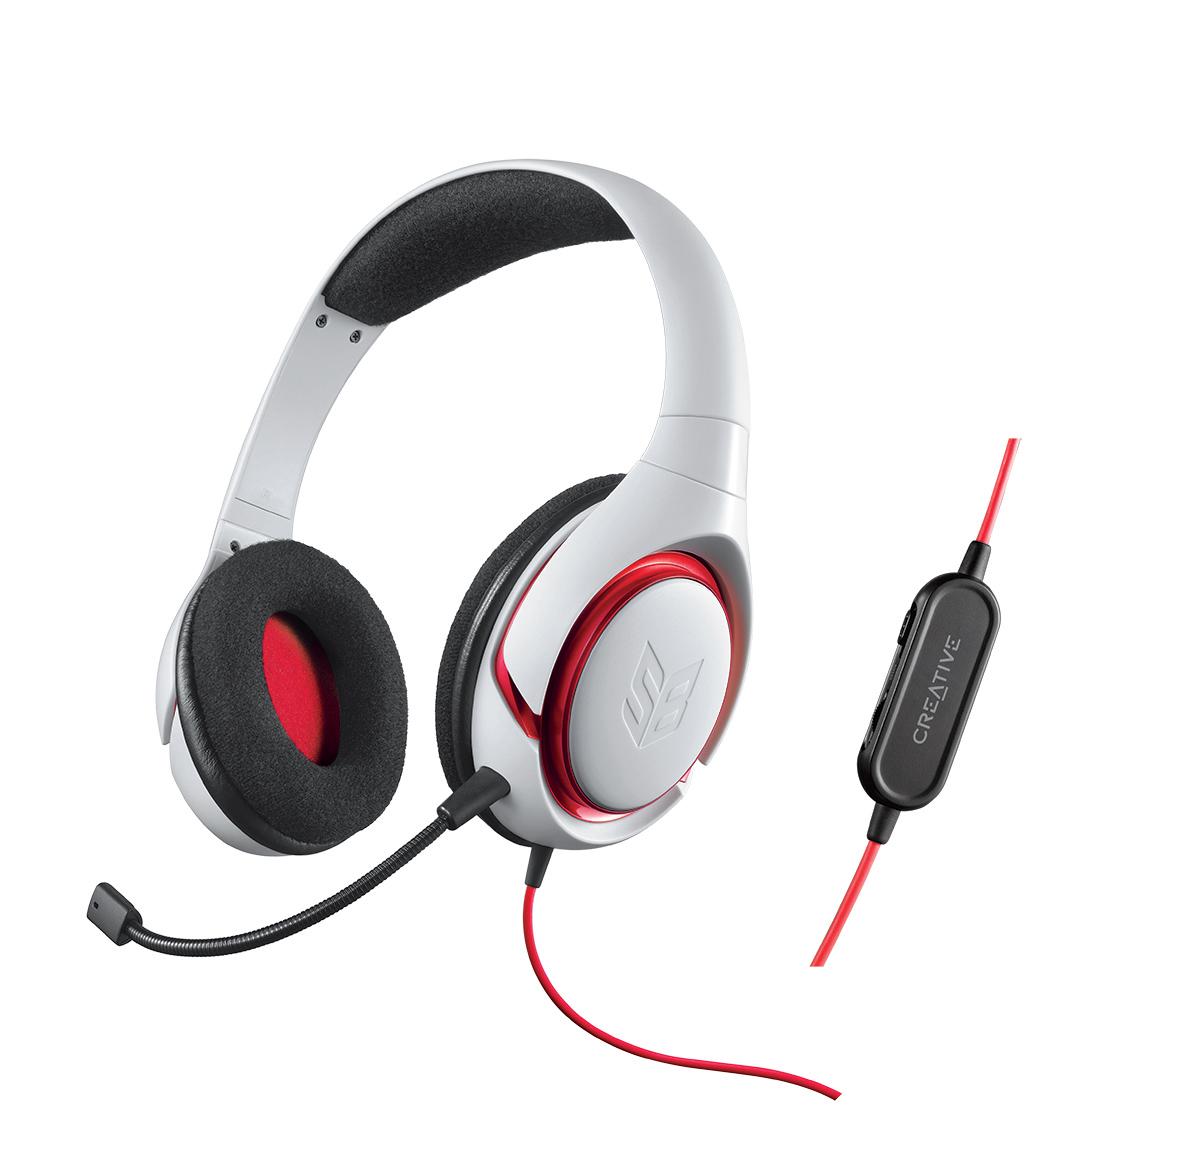 le casque gaming sound blaster inferno en blanc tplpc com. Black Bedroom Furniture Sets. Home Design Ideas